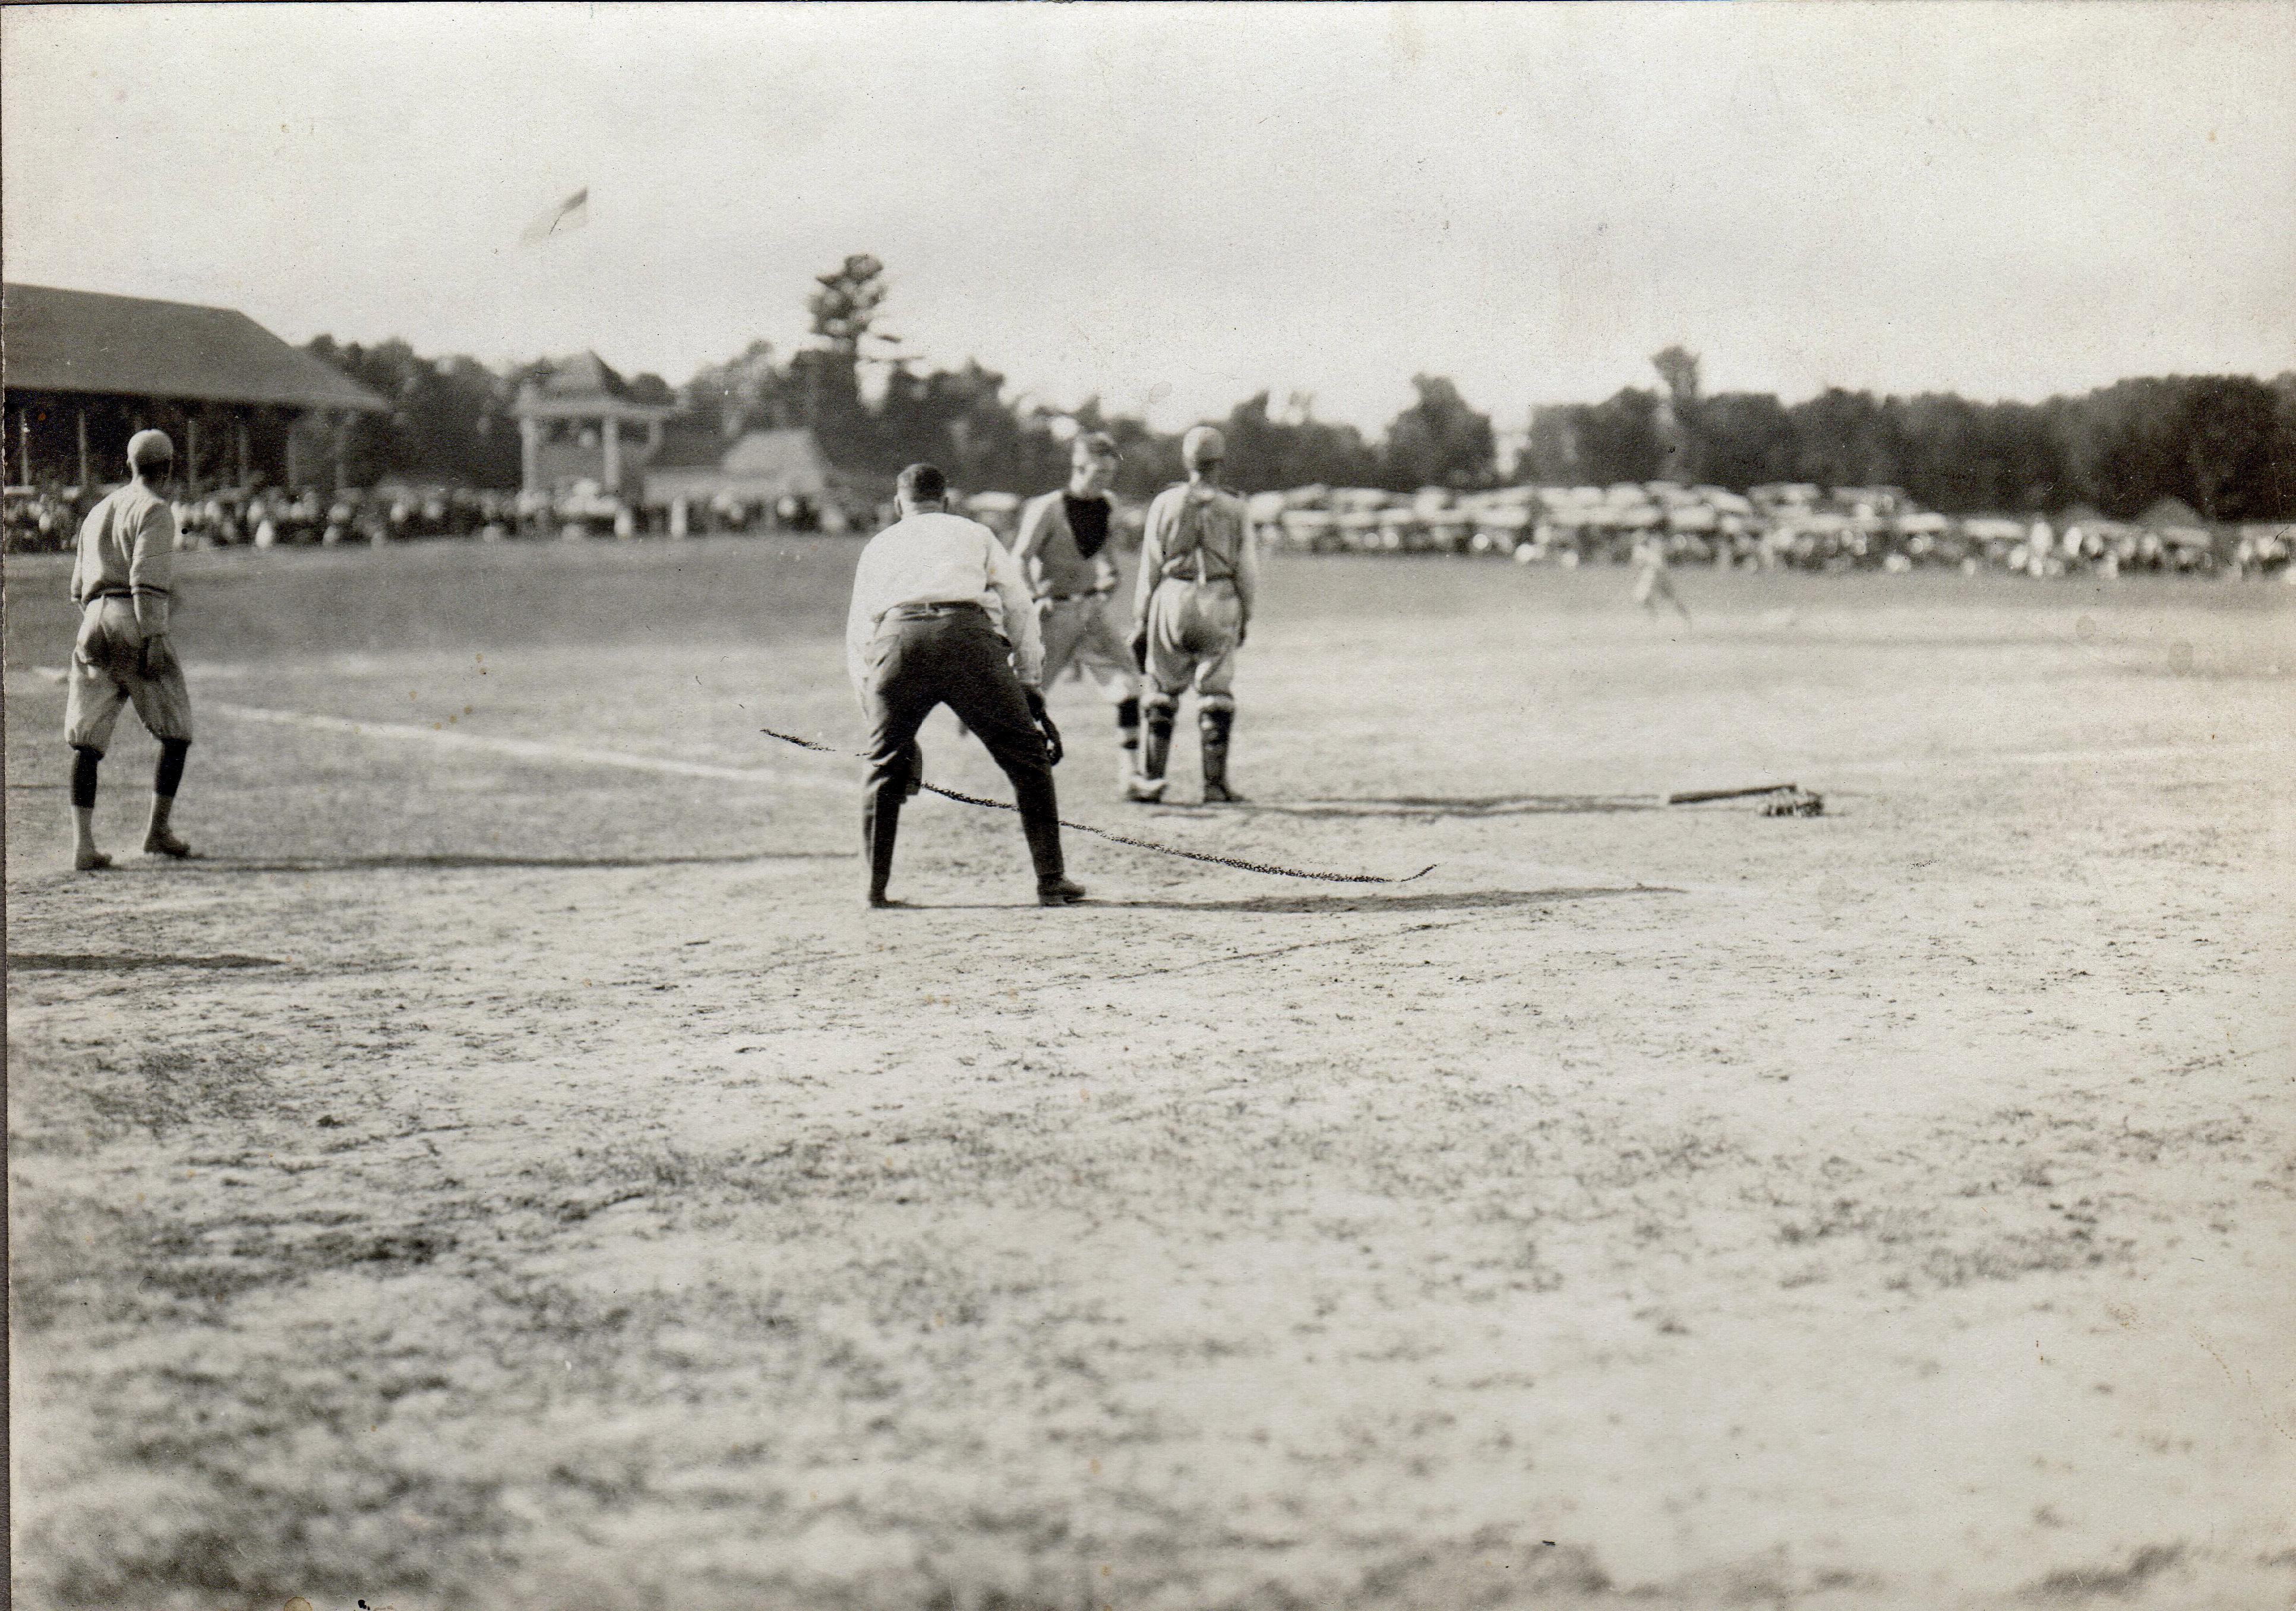 Ball Game at North Street Park